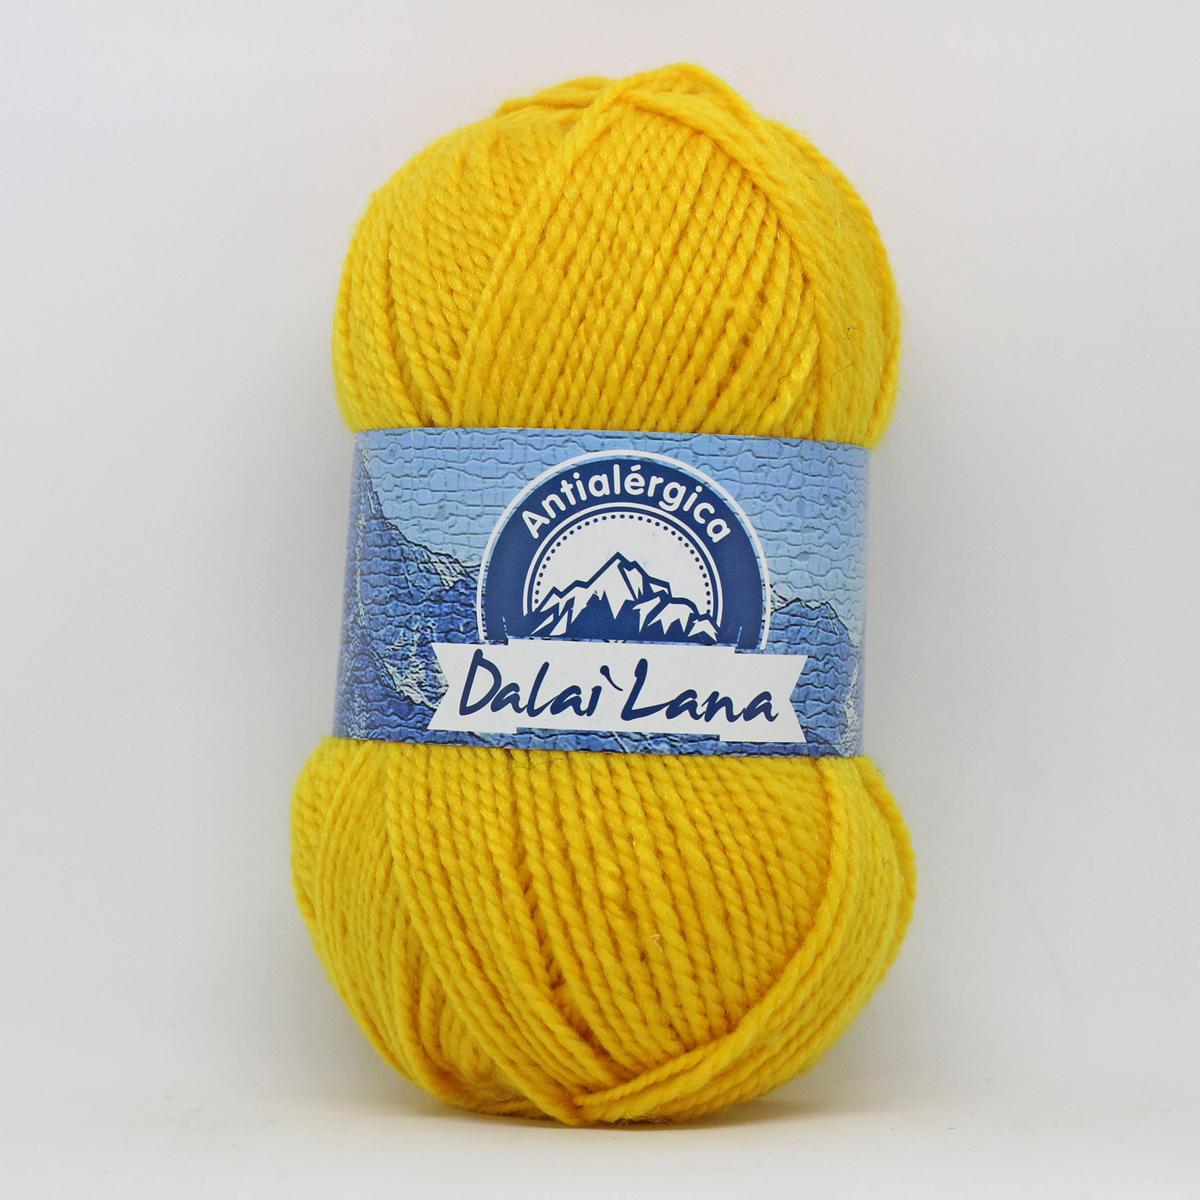 Dalai Lana - 761